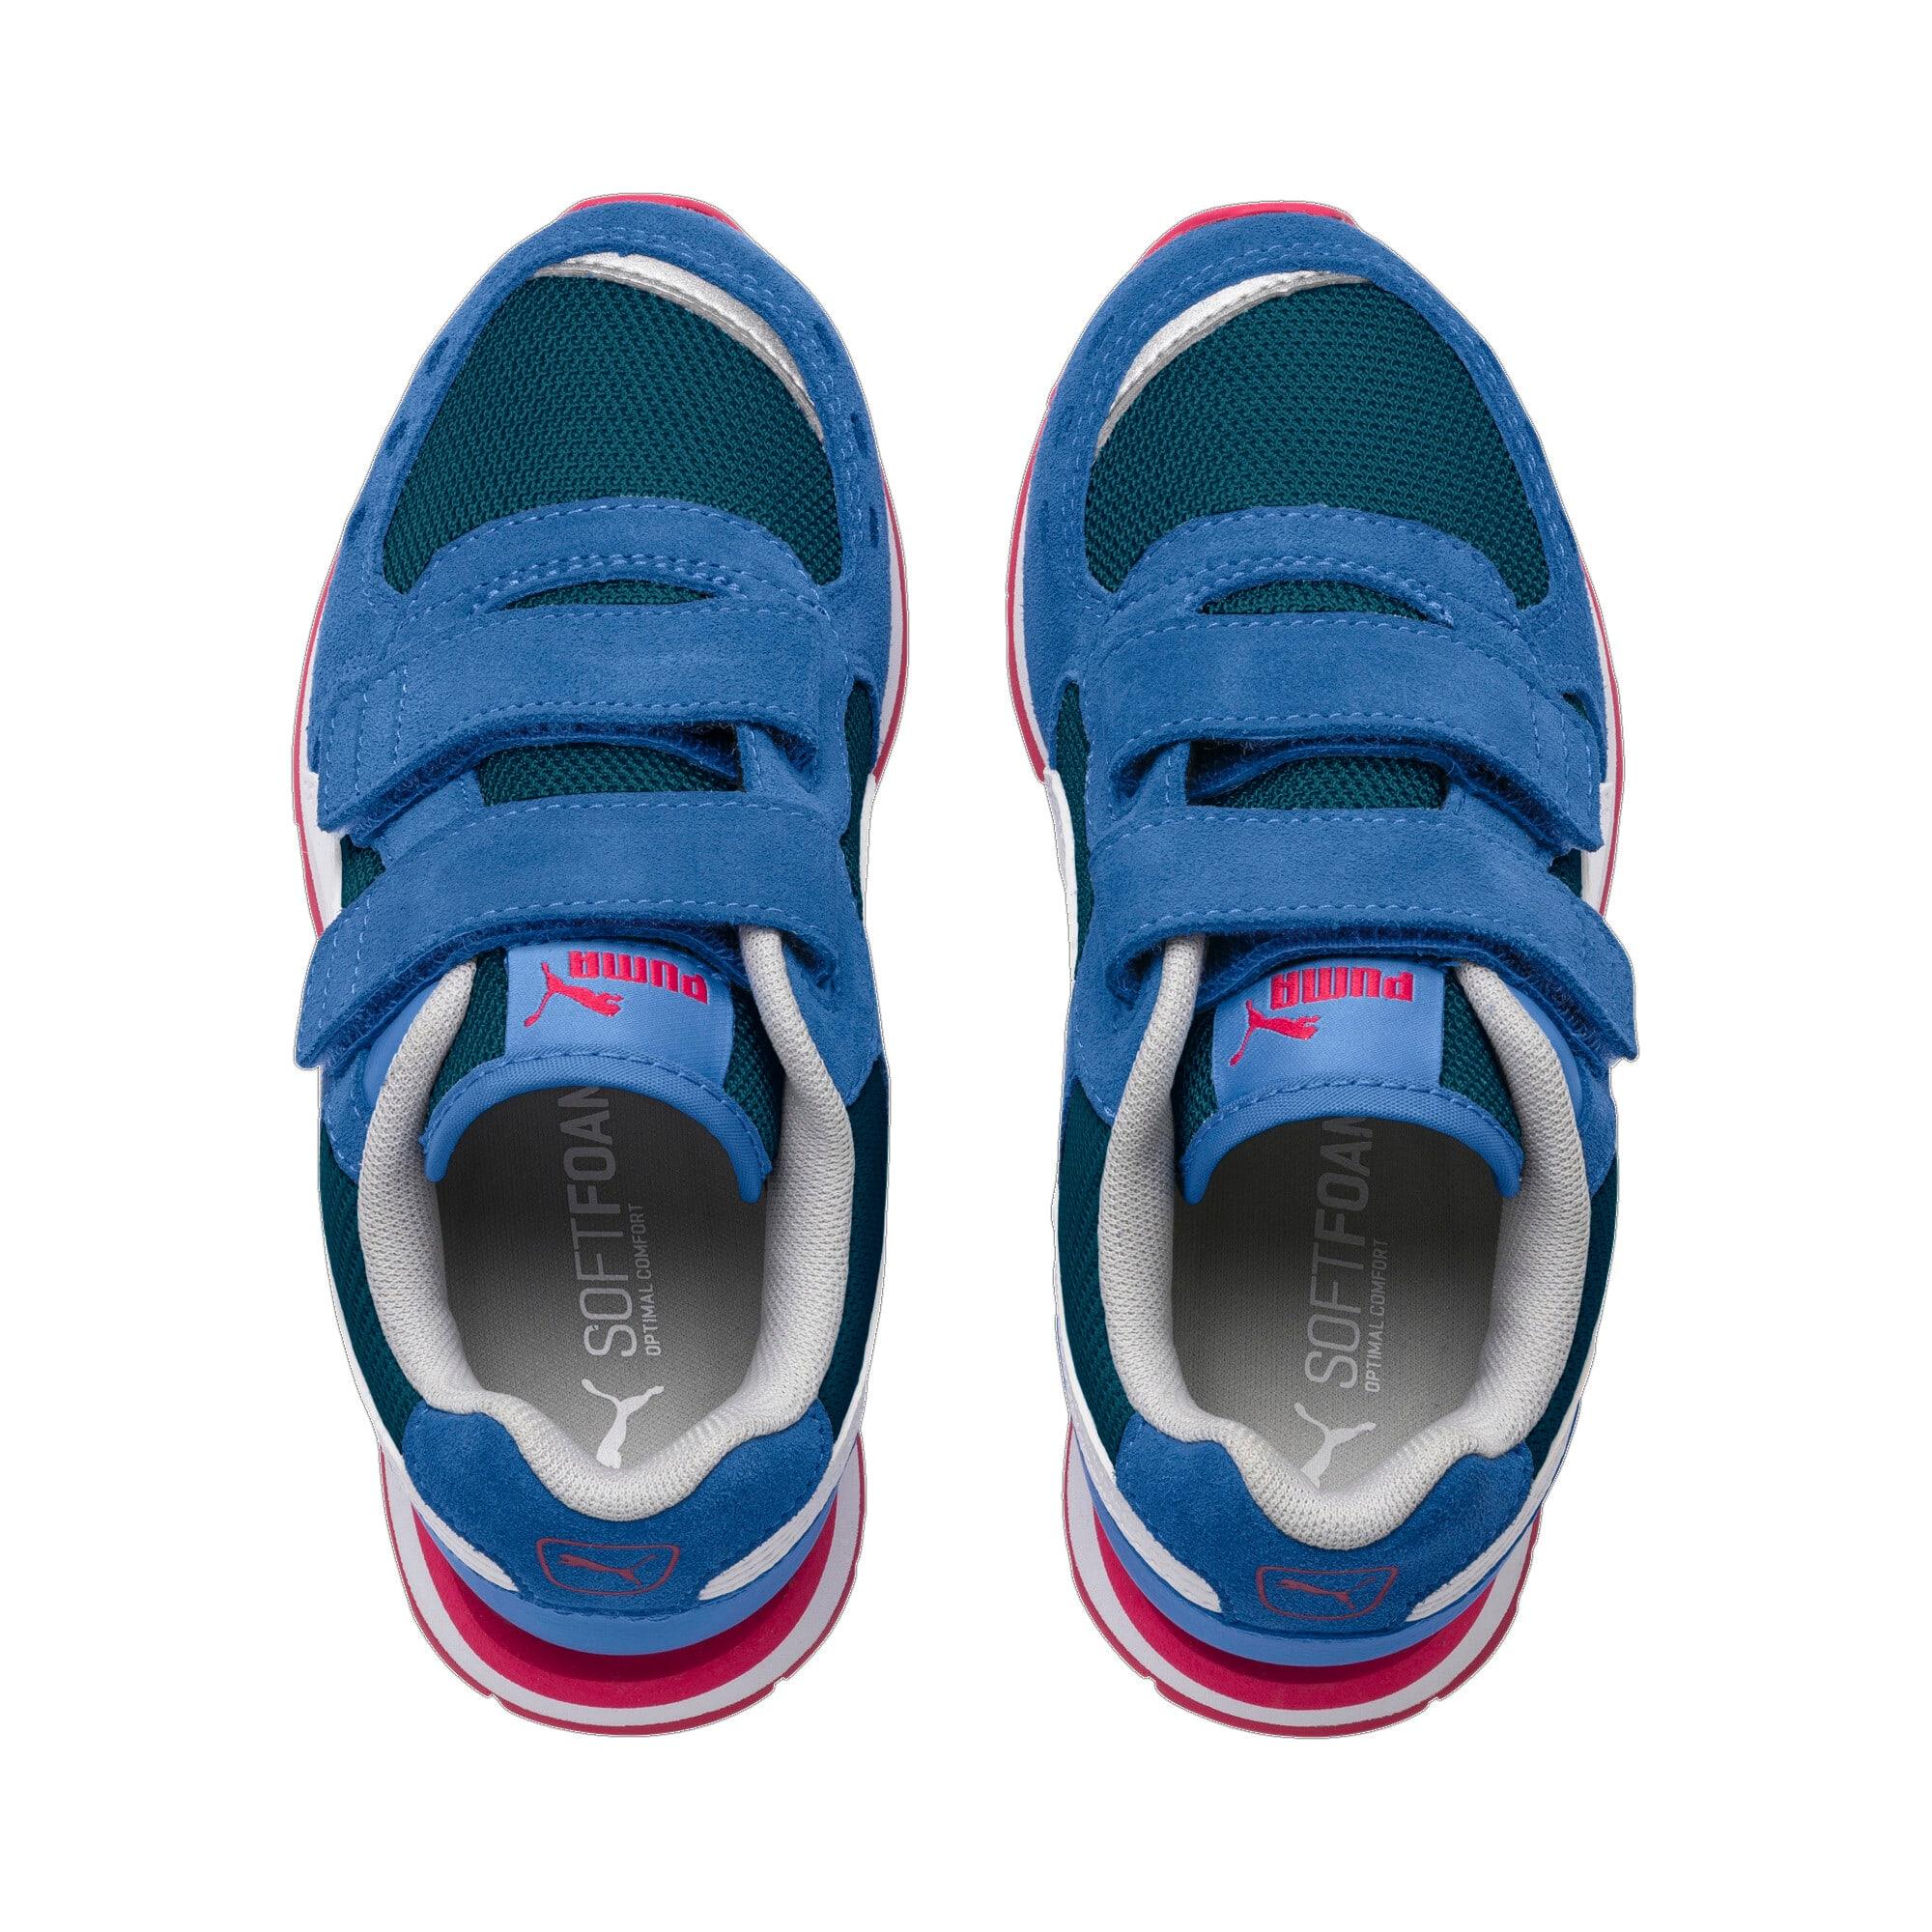 Thumbnail 6 of Vista Little Kids' Shoes, Ultramarine-Puma White, medium